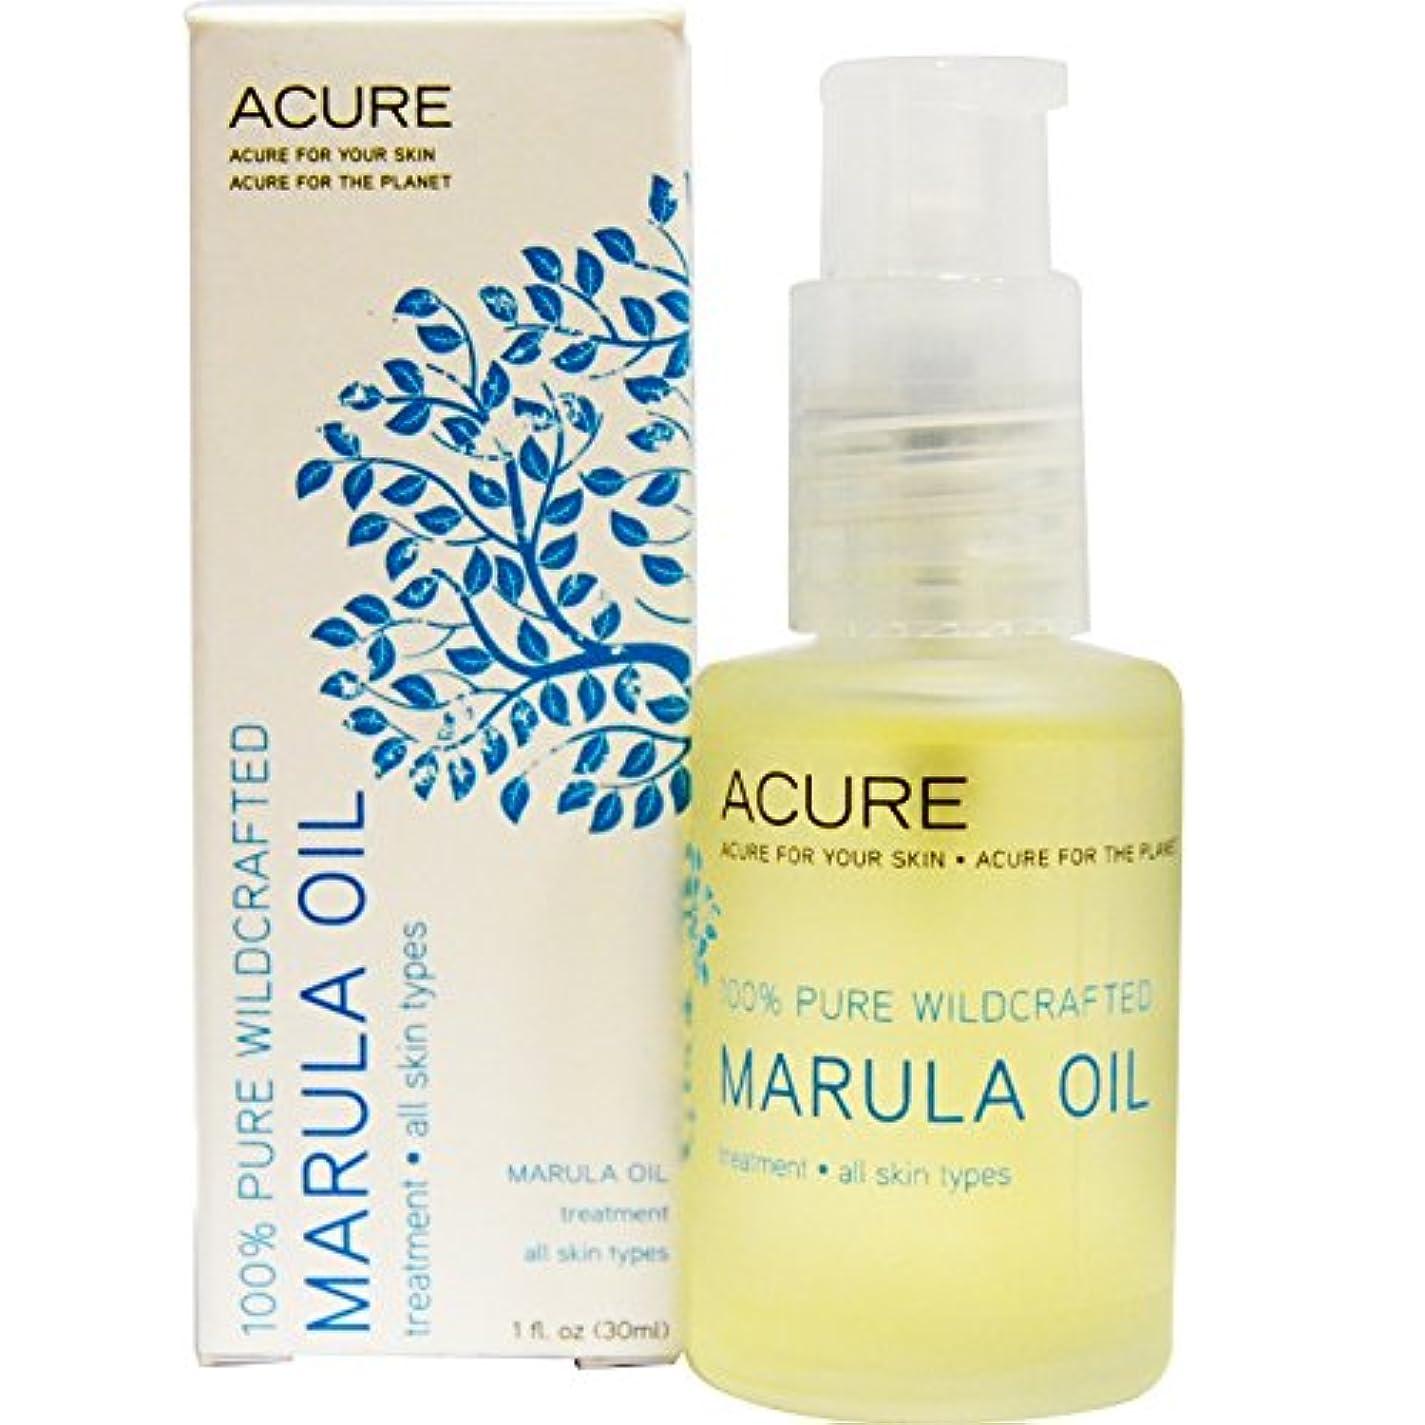 Acure Organics, Marula Oil, ジ?エッセンシャルズ、マルーラオイル 1 oz (30 ml)